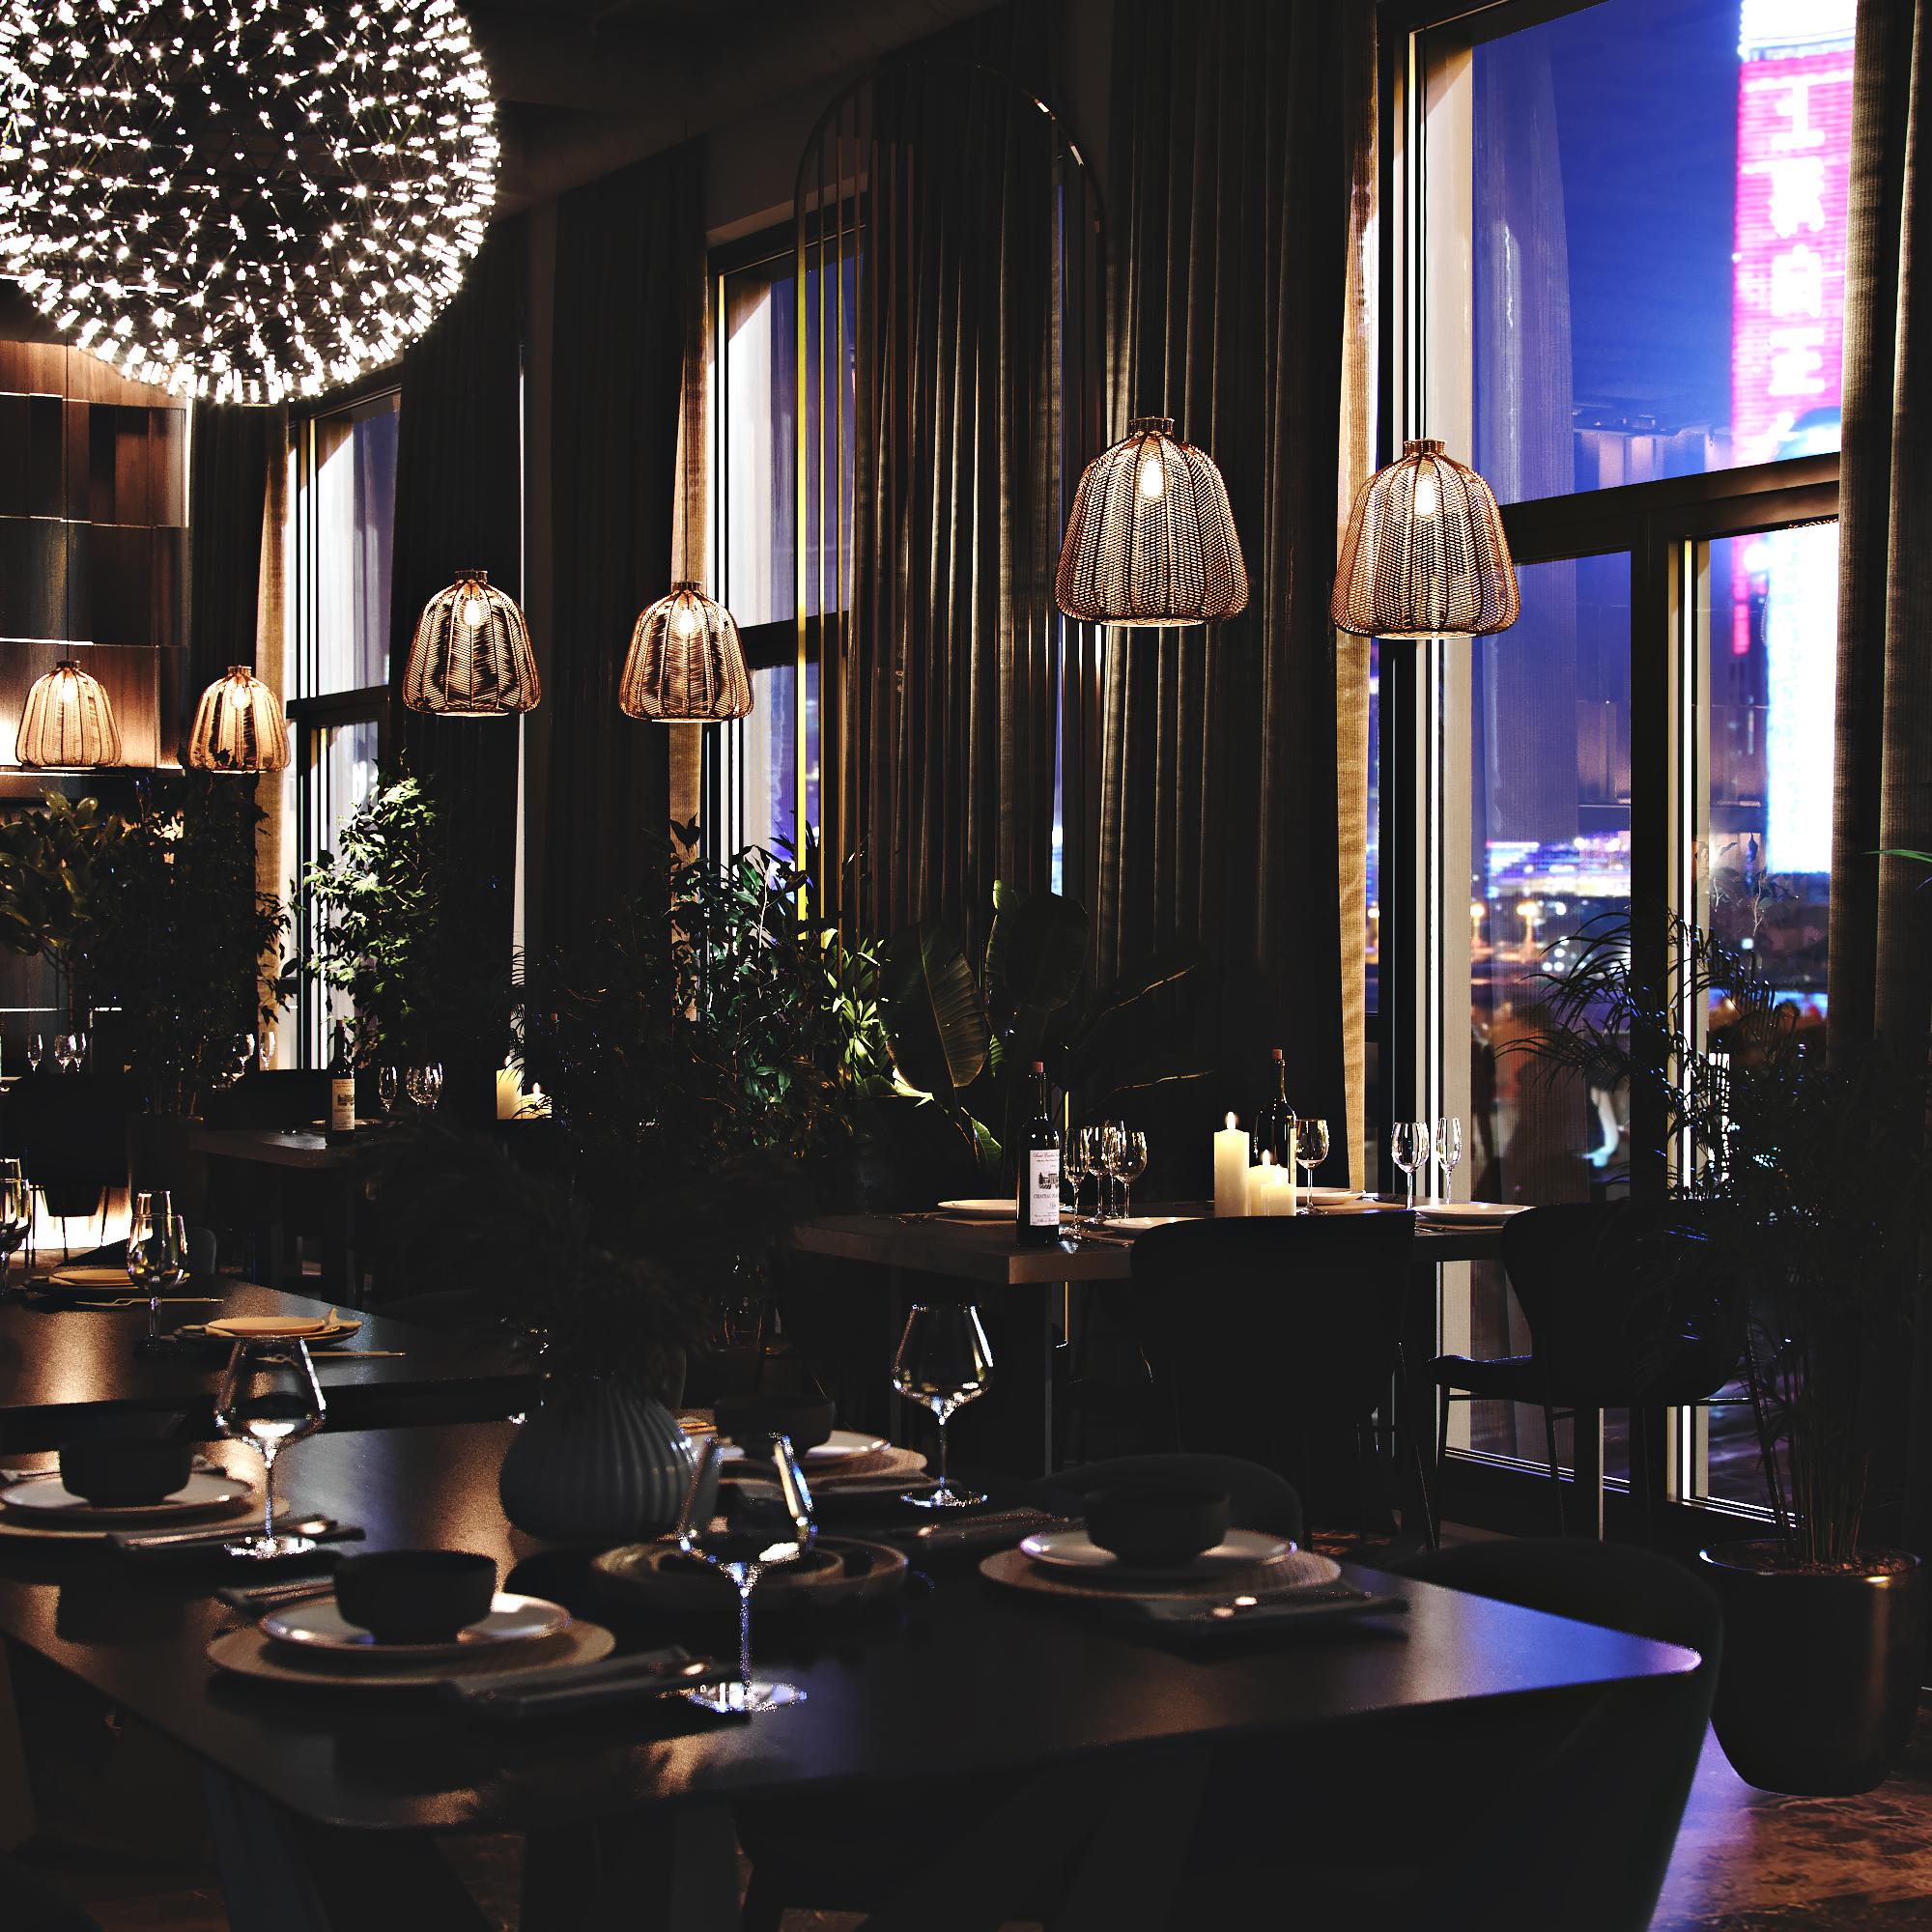 Интерьер ресторана. Вид 1.